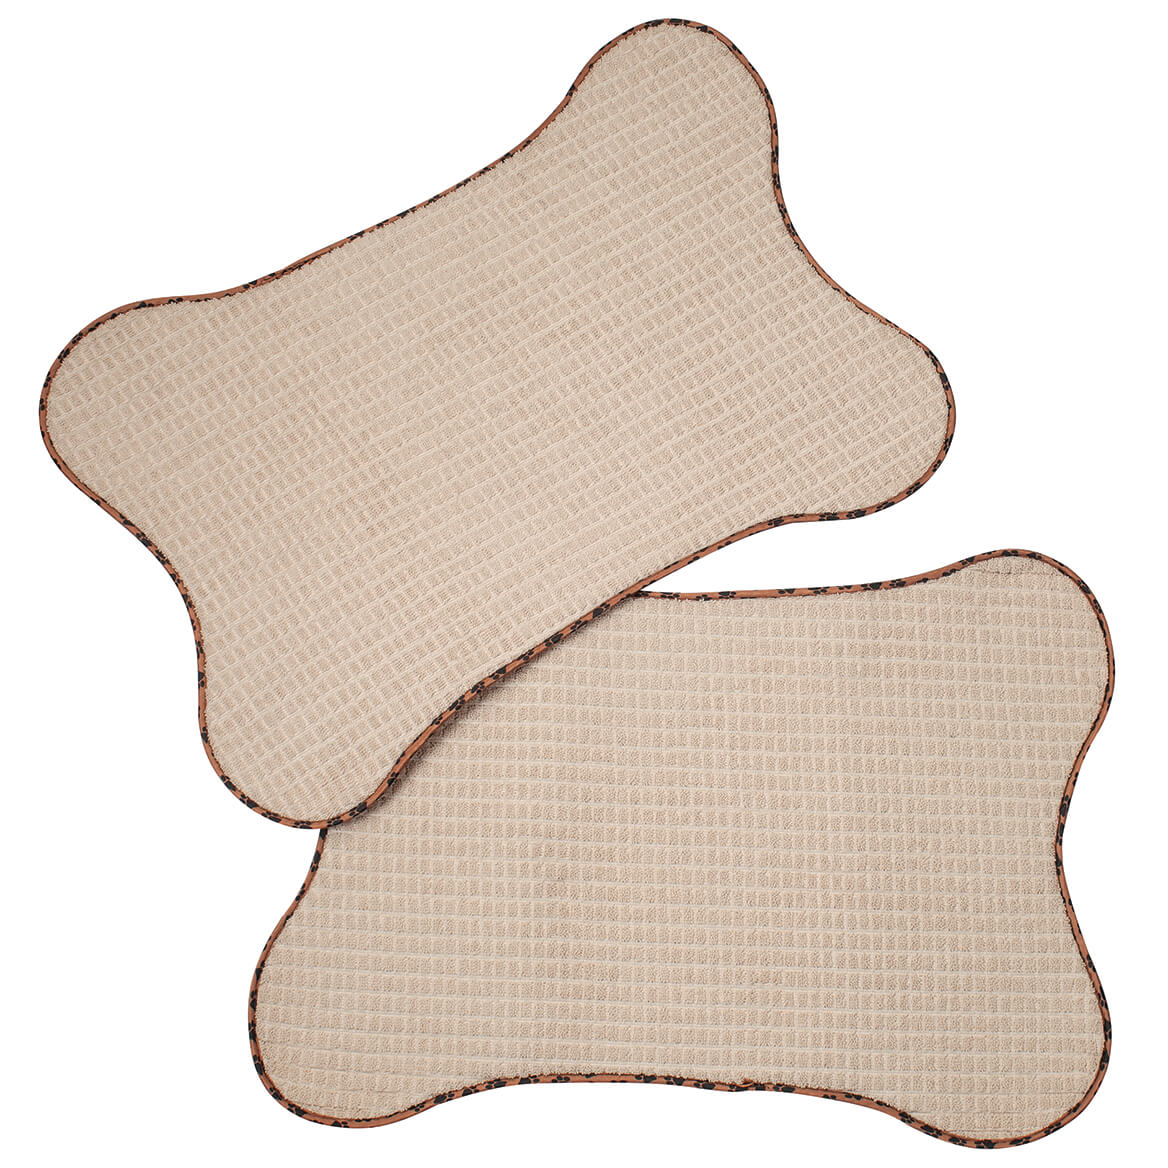 Bone-Shaped Pet Mats, Set of 2-369629